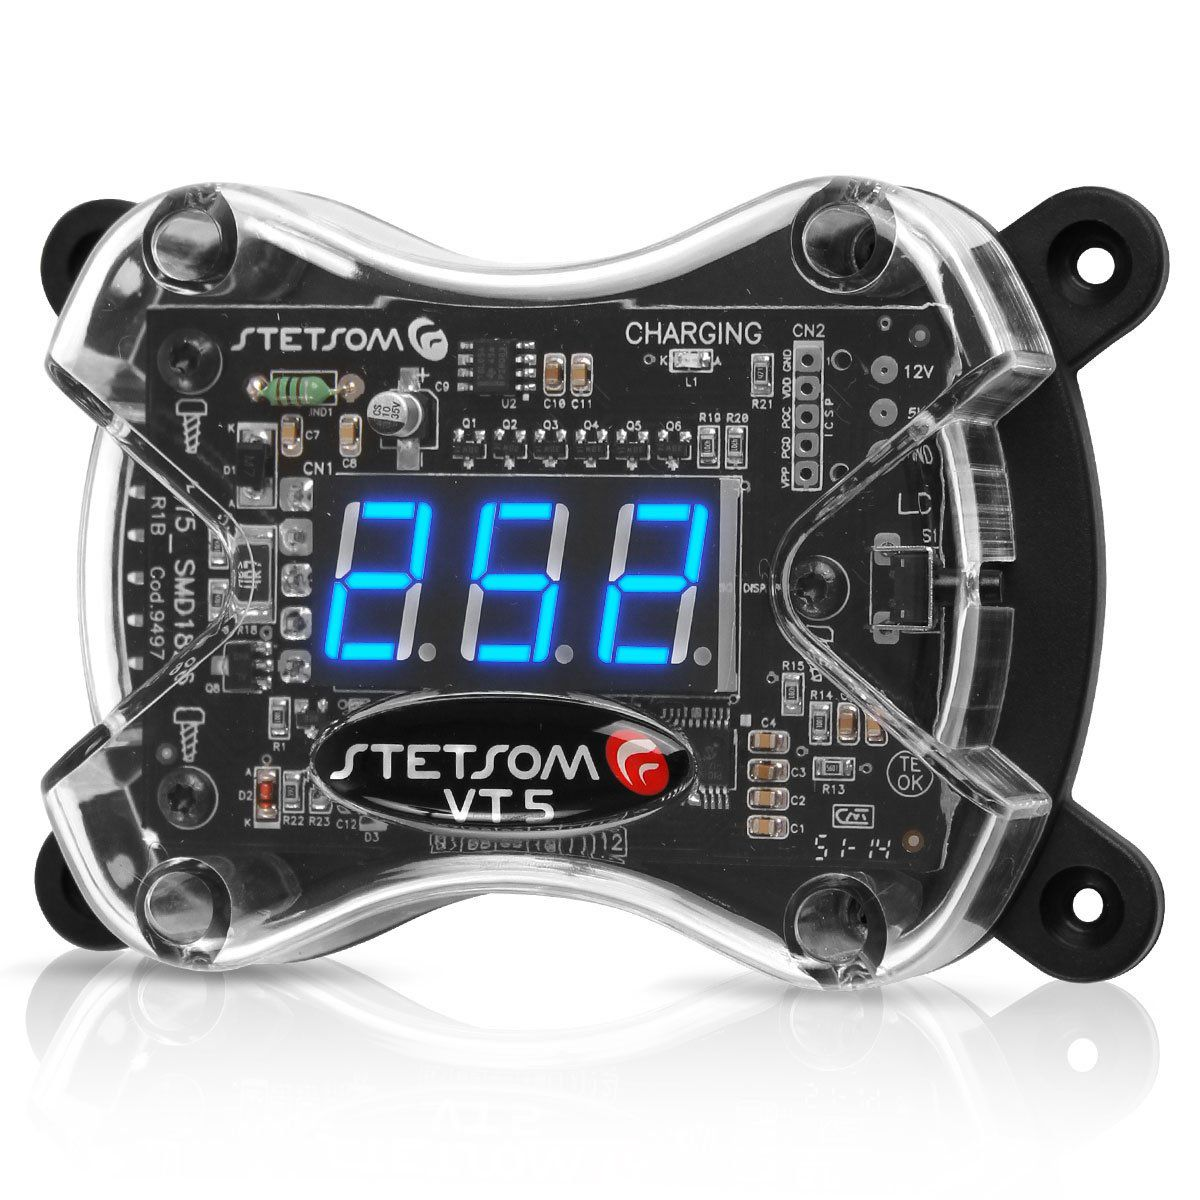 Voltímetro Digital Stetsom 0 a 390 Volts 4 Ma Vt5